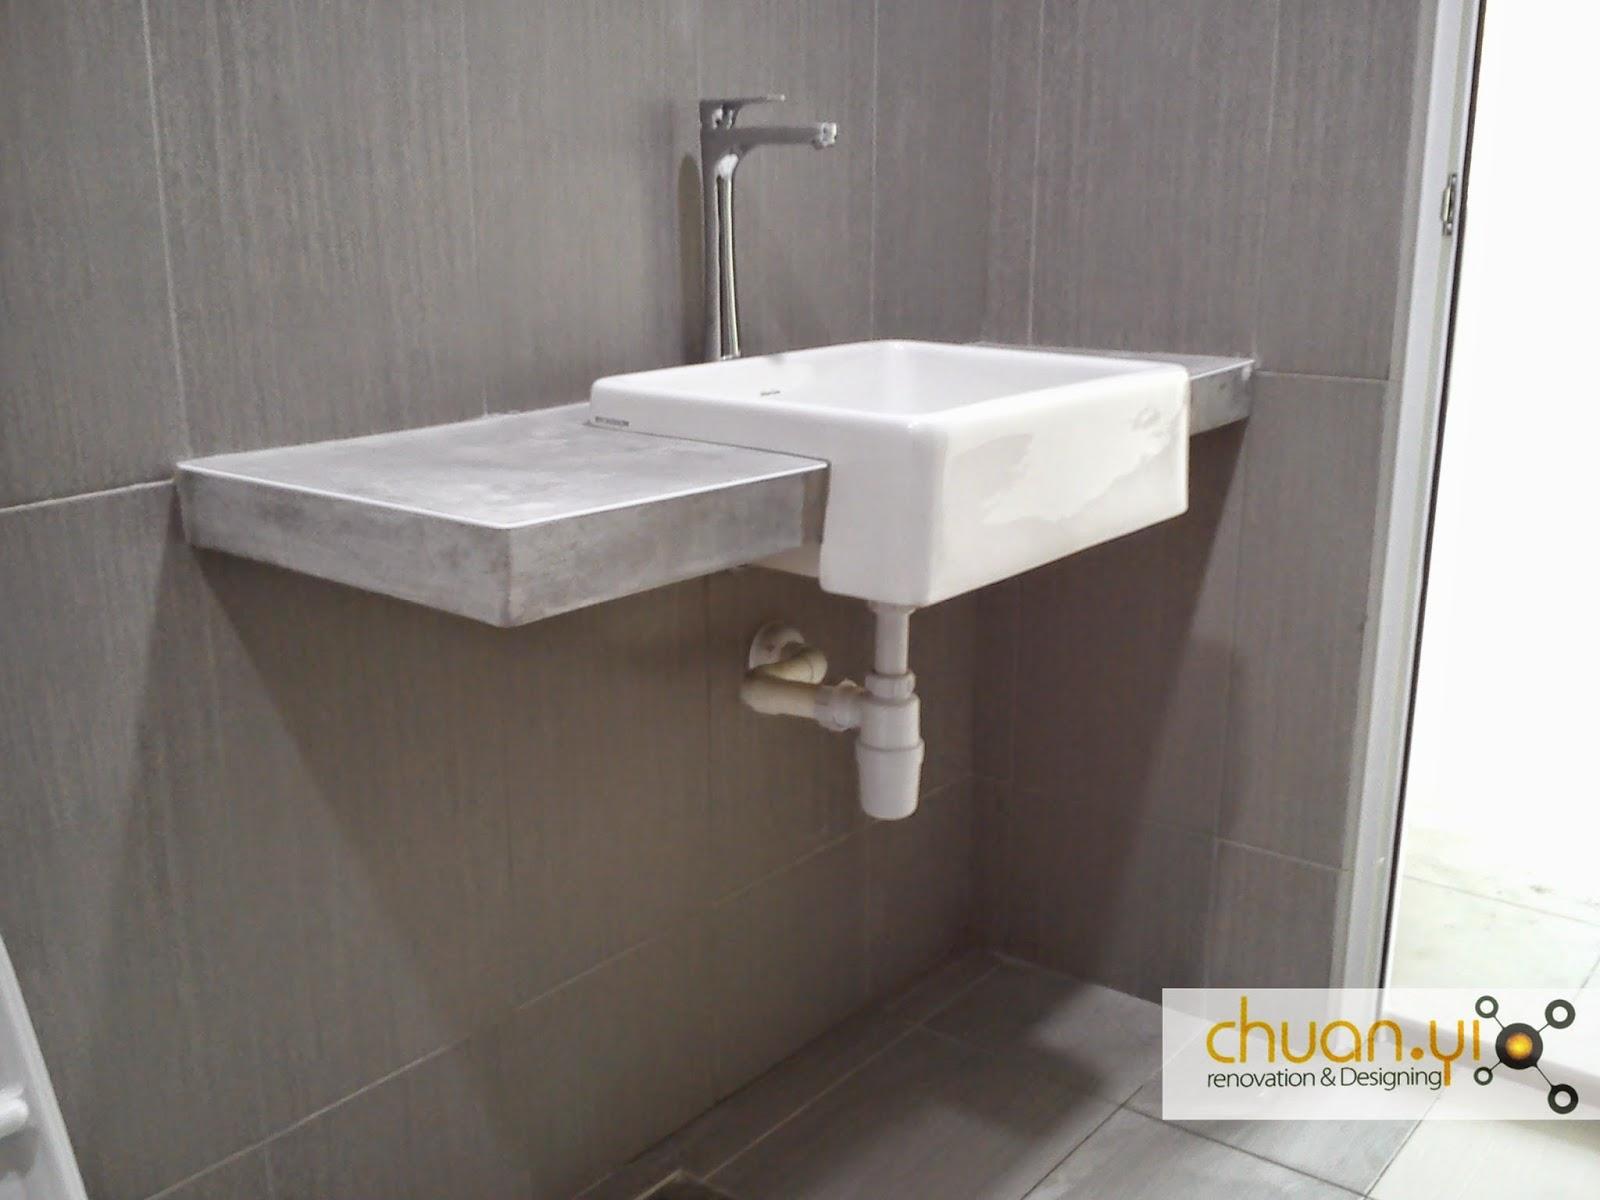 Chuan yi construction renovation sdn bhd master bath for E bathroom solution sdn bhd